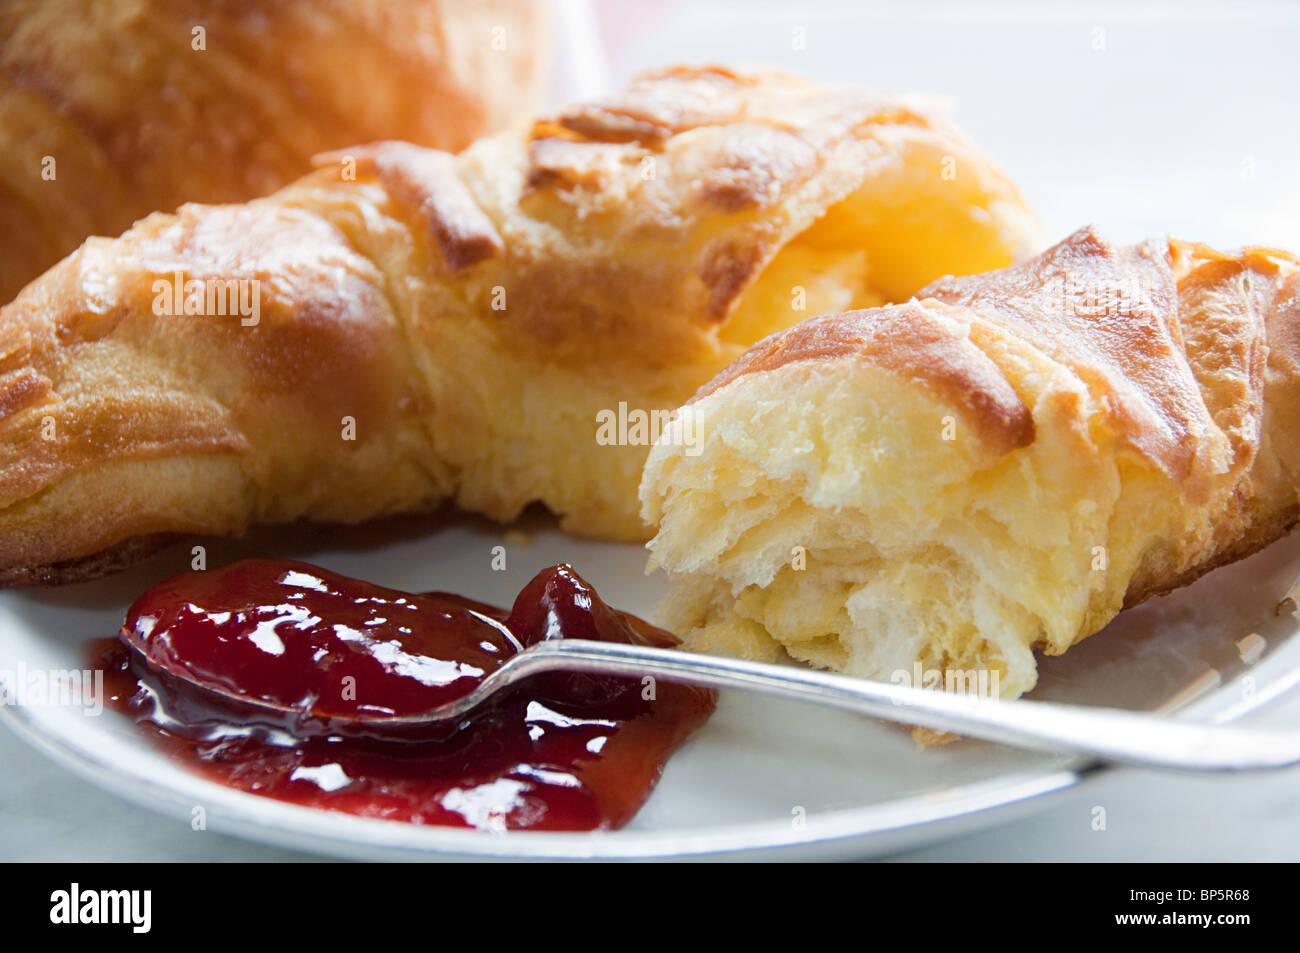 Croissant y mermelada Imagen De Stock